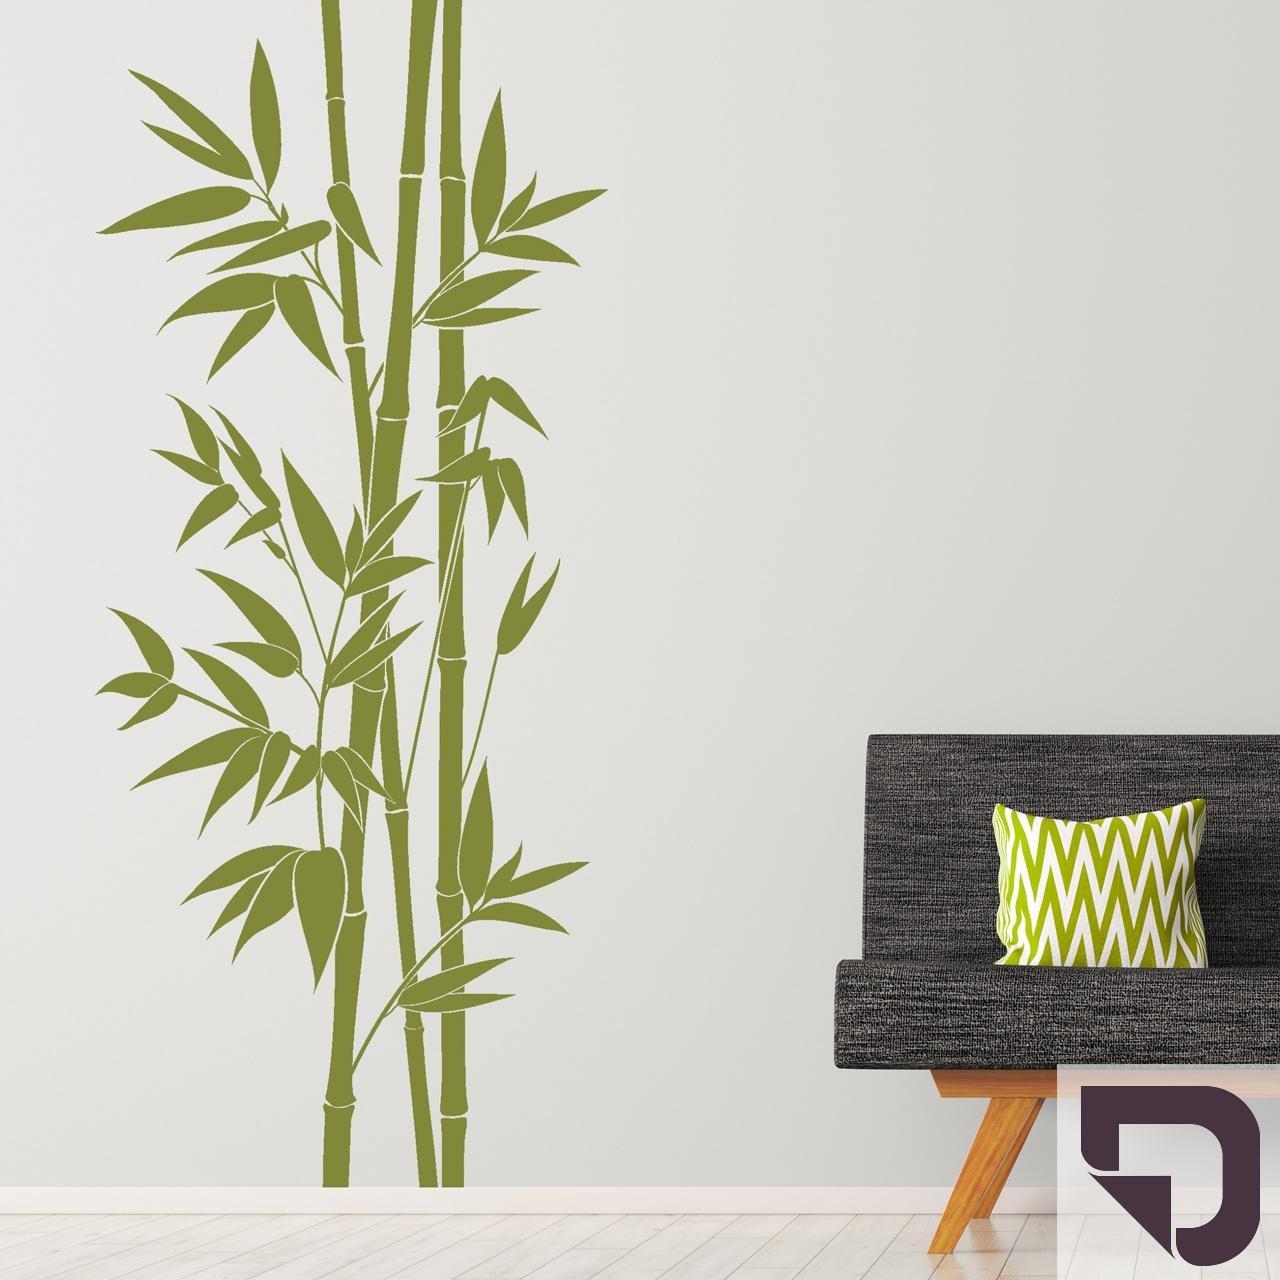 DESIGNSCAPE® Wandtattoo XXL-Bambus     Wandtattoo Pflanze Bamboo 113 x 260 cm (Breite x Höhe) weiss DW804164-L-F5 B072LNGM4M Wandtattoos & Wandbilder 6c5819